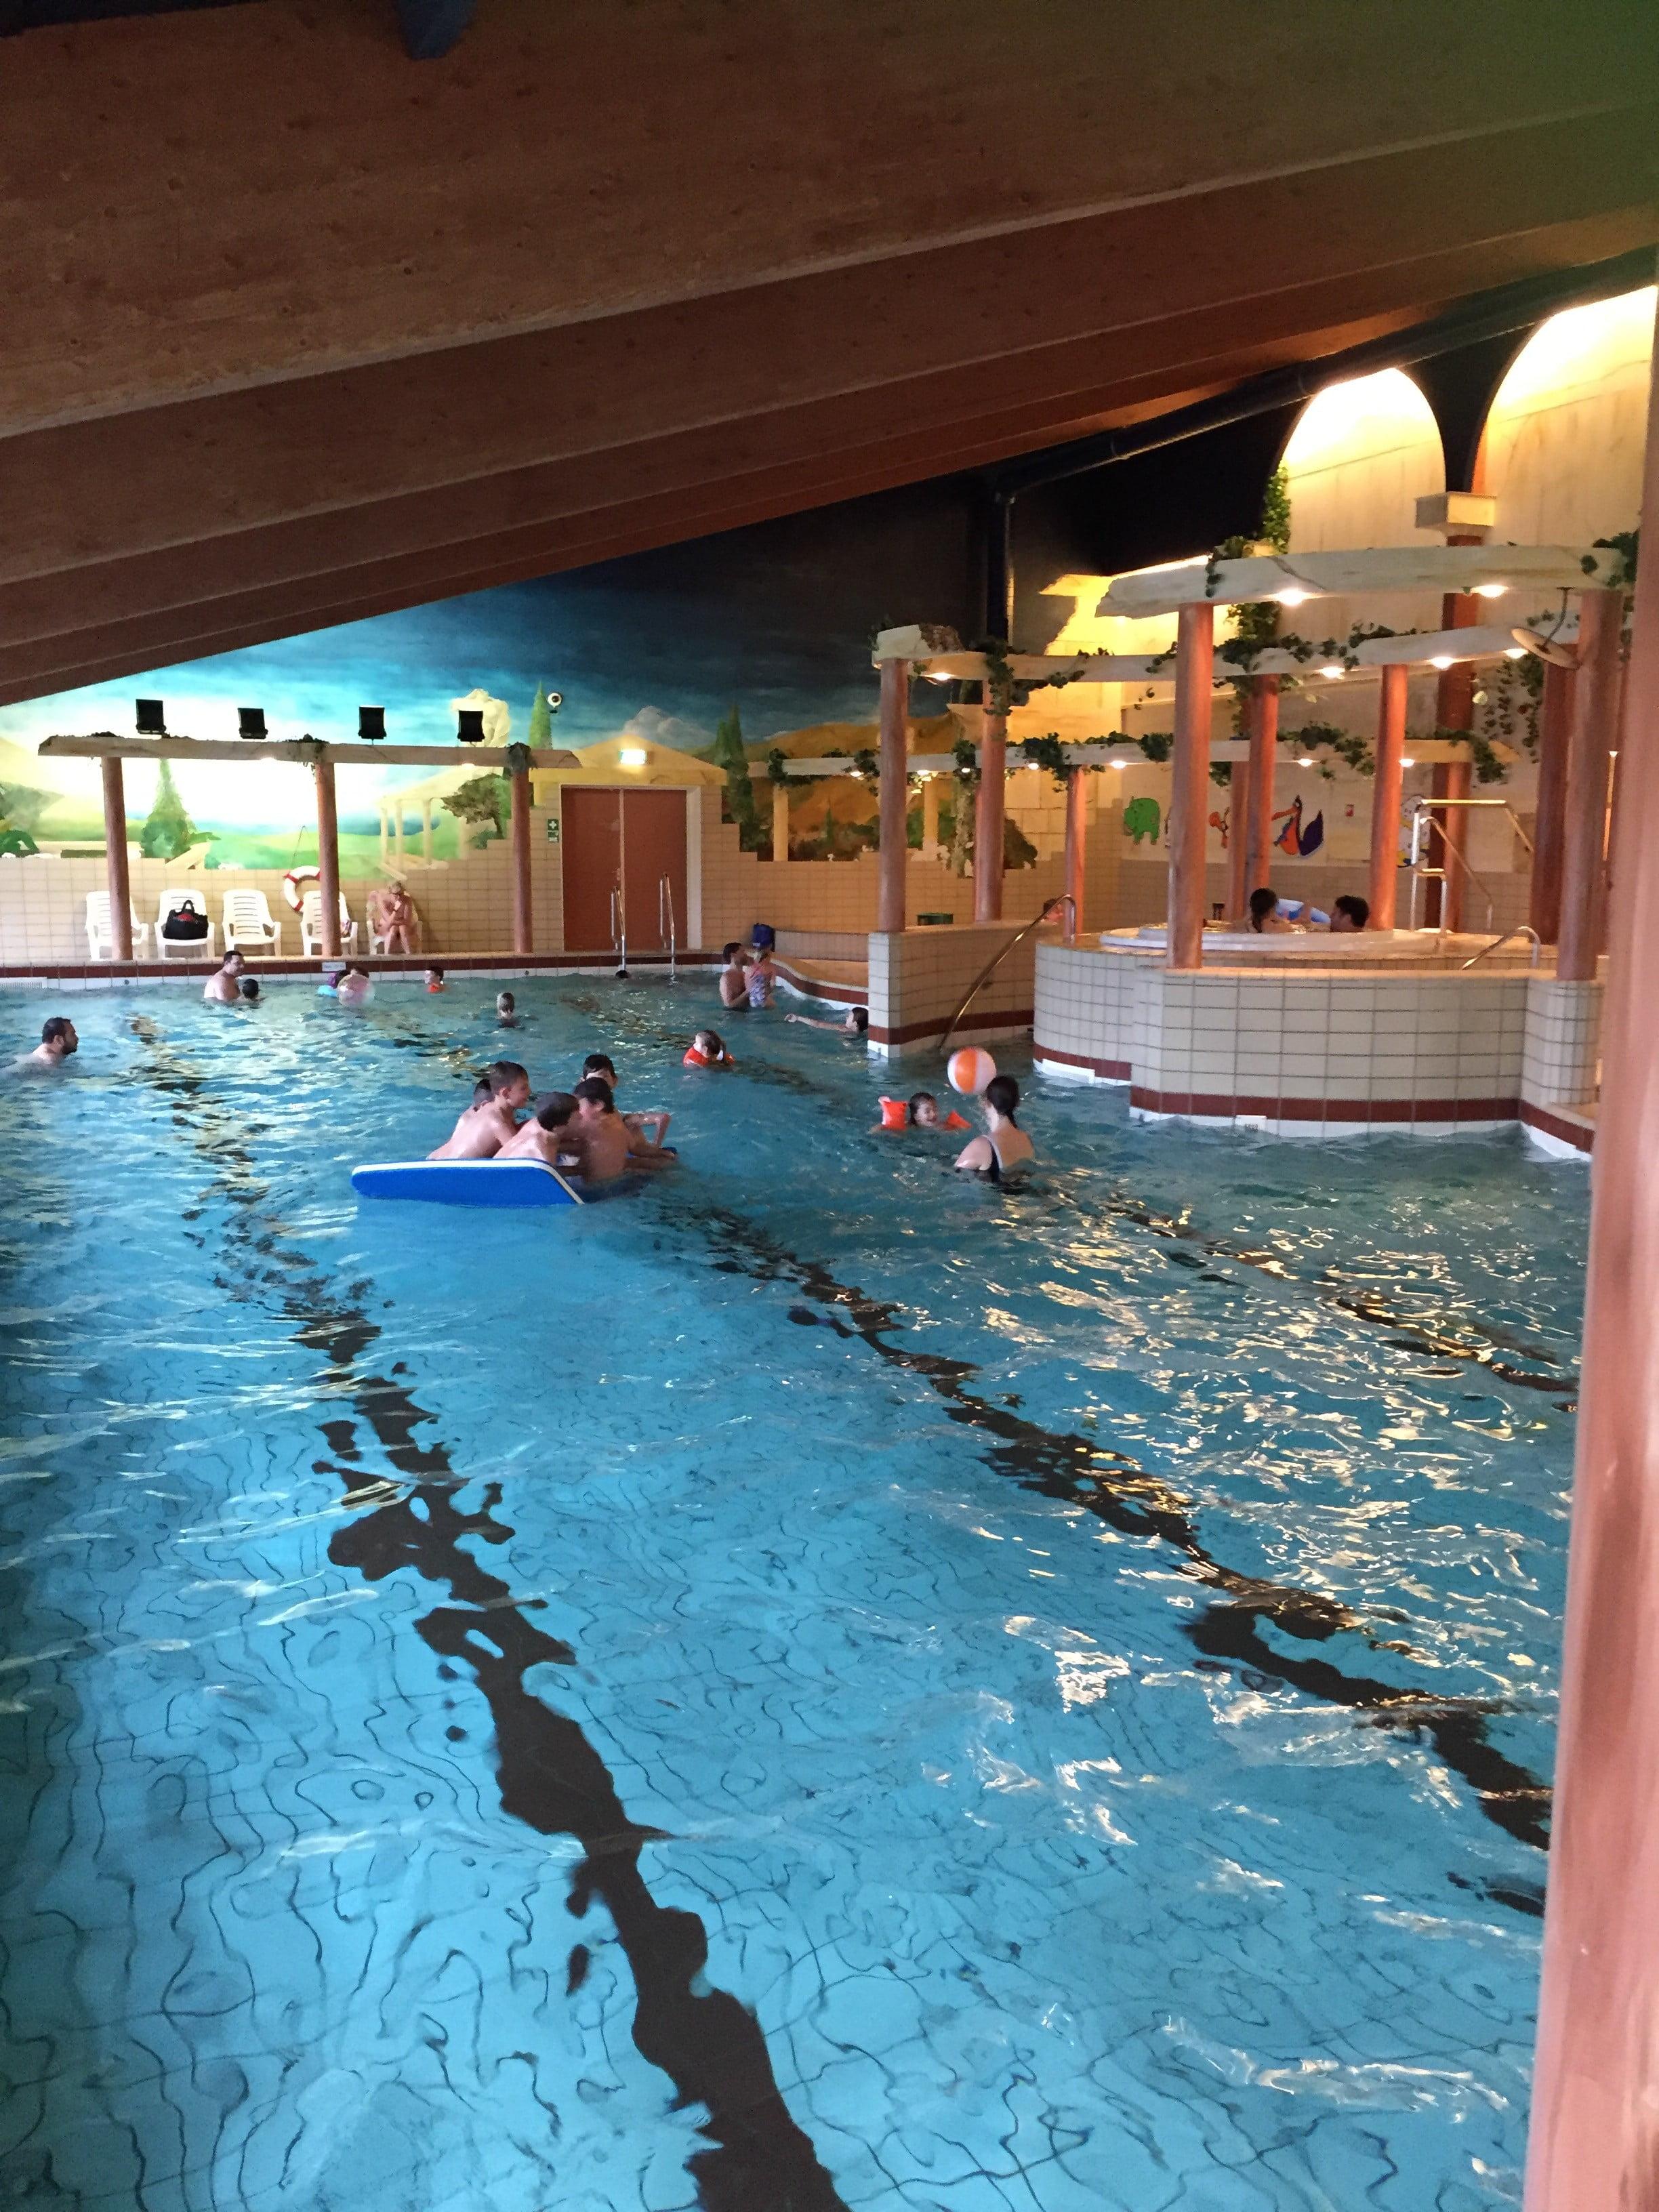 Swimmingpool Kijkduinpark